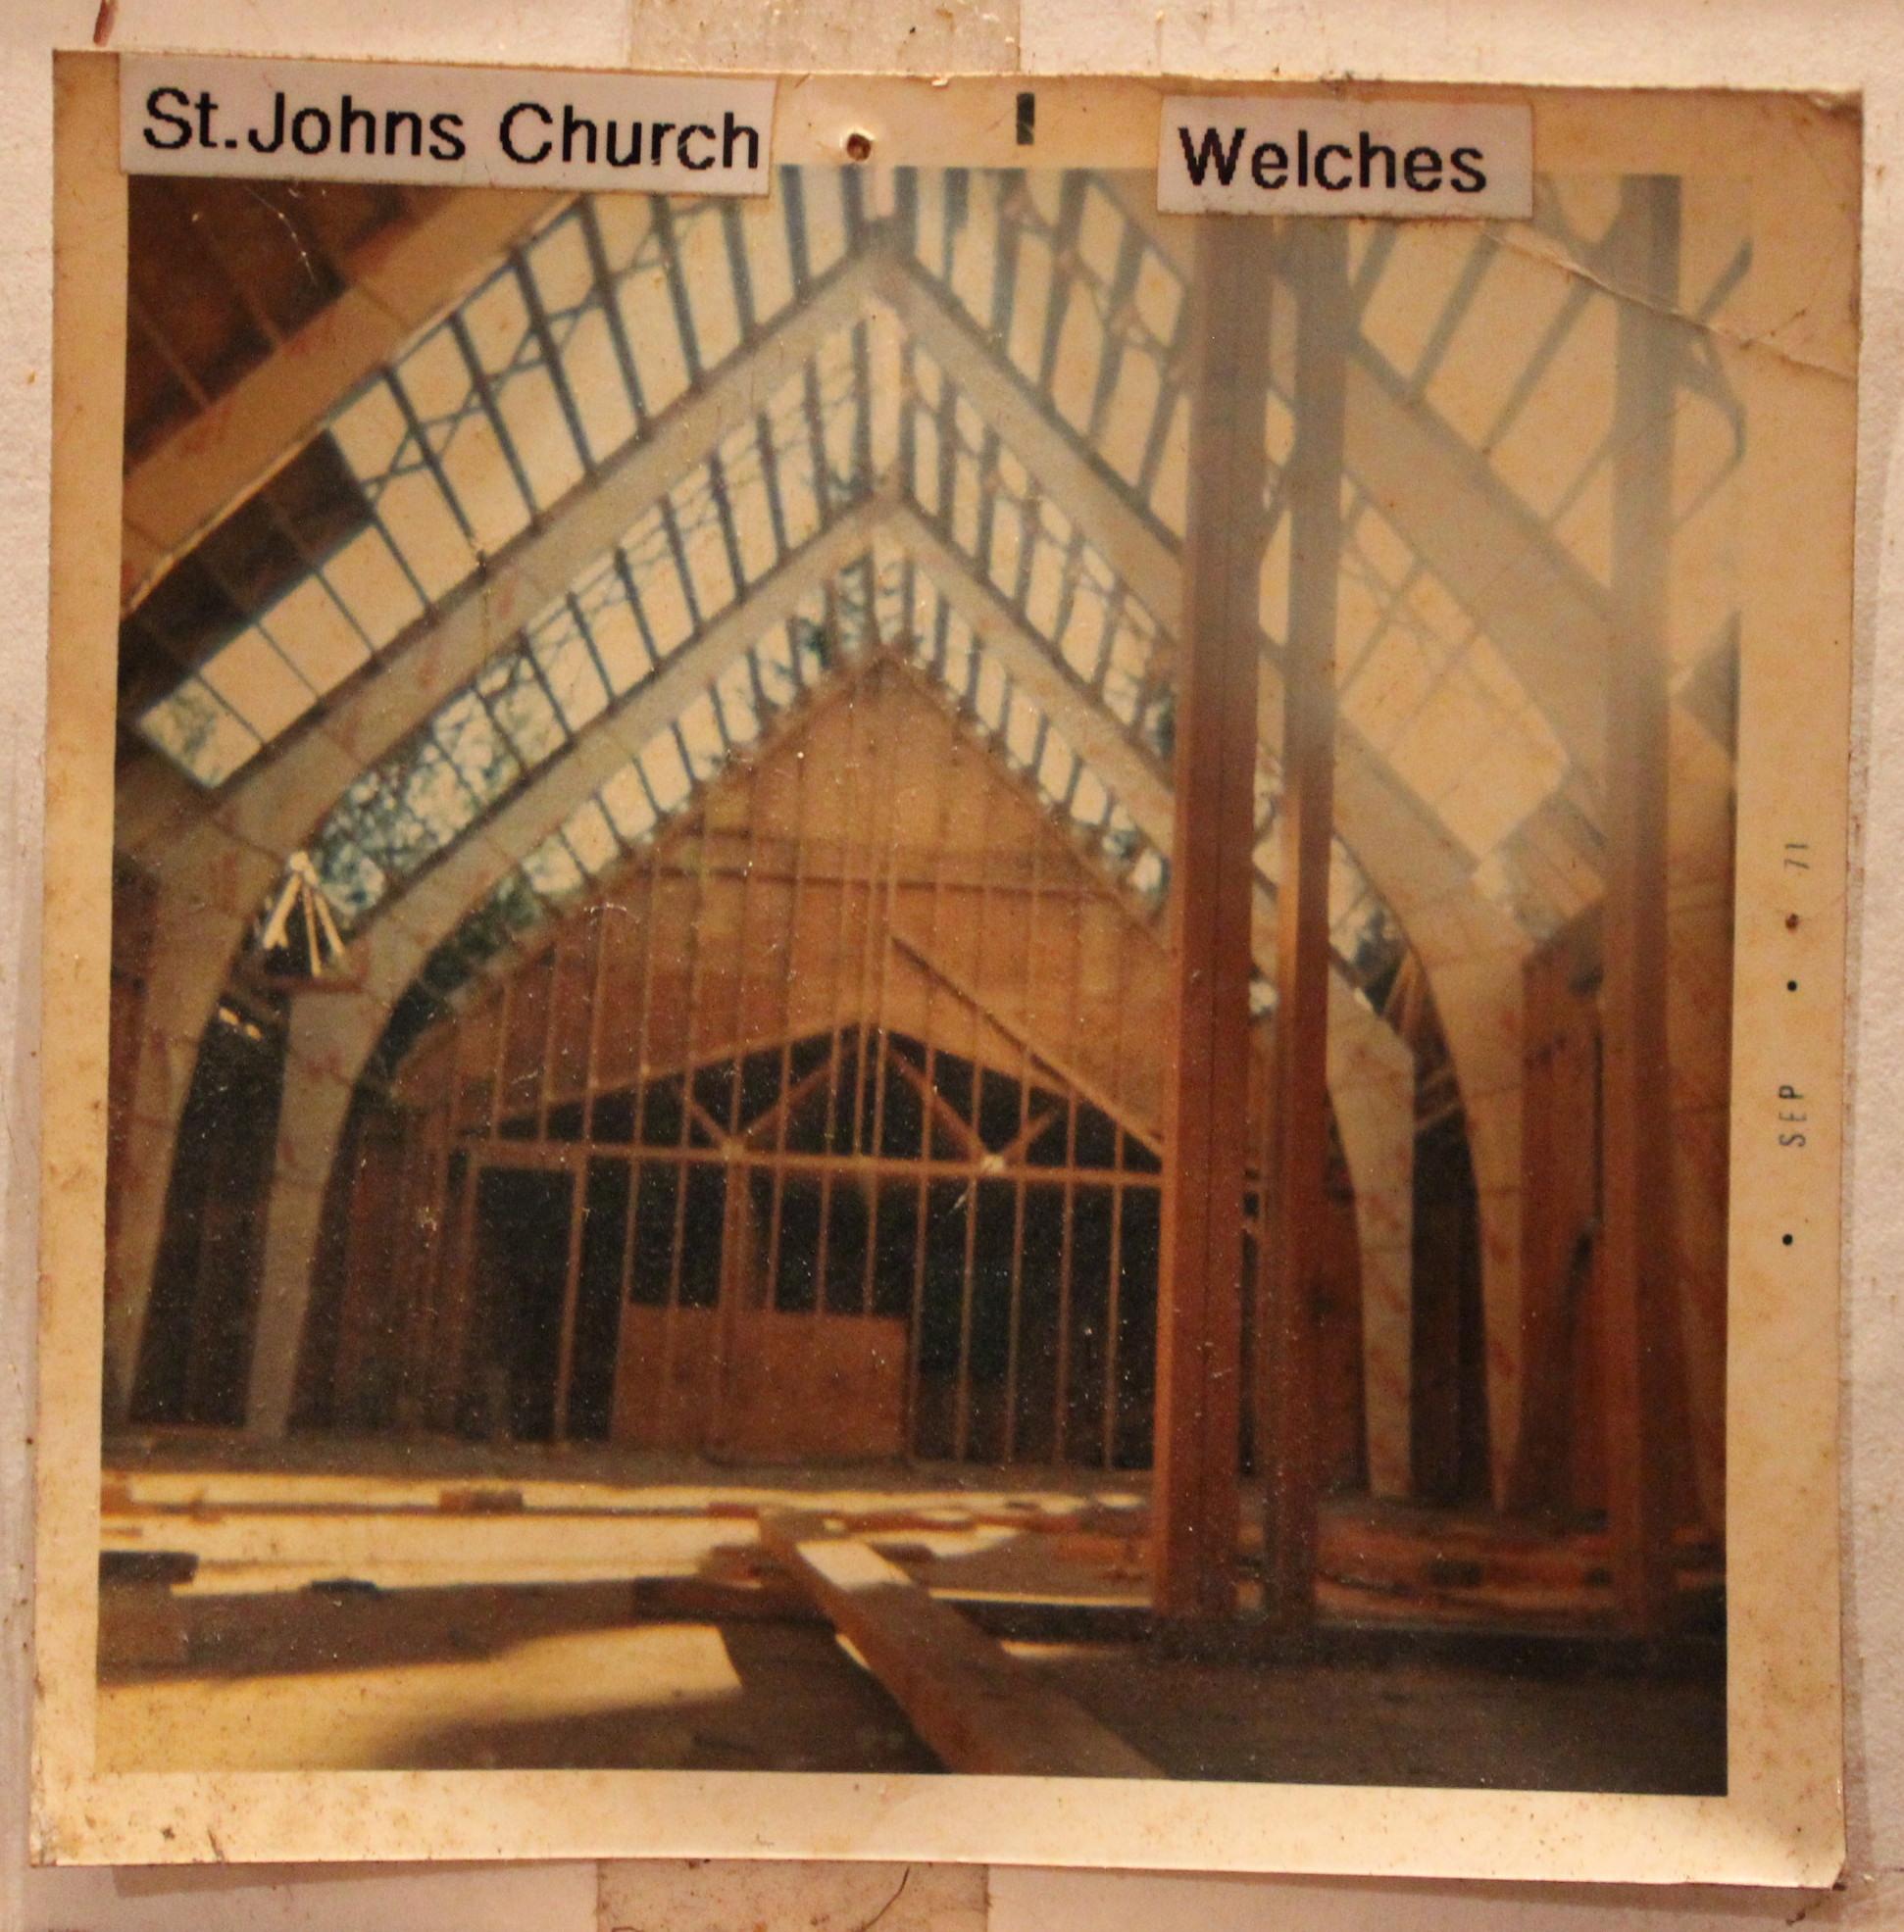 St Johns Church 1.JPG